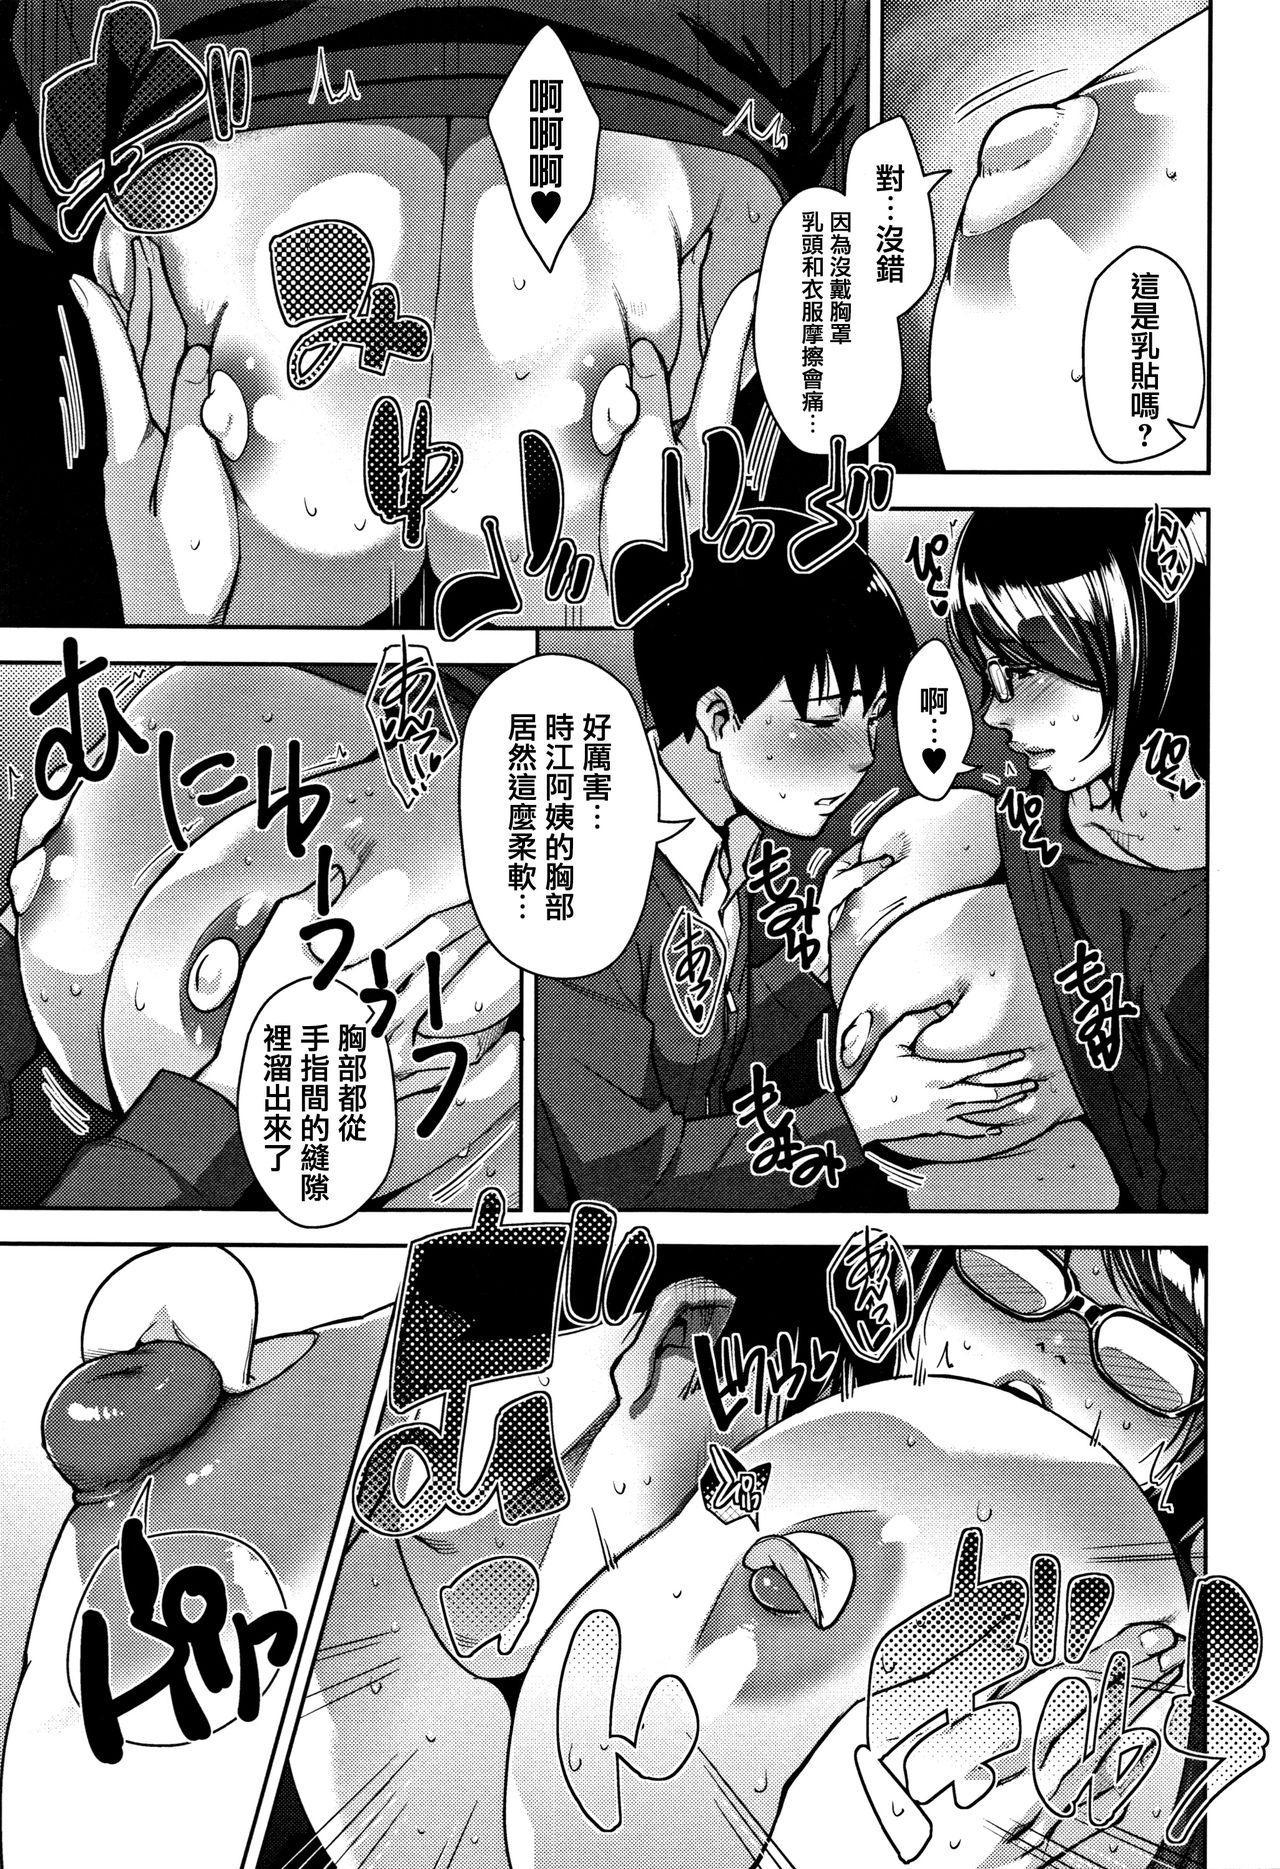 Kanjyuku Chijyo 62